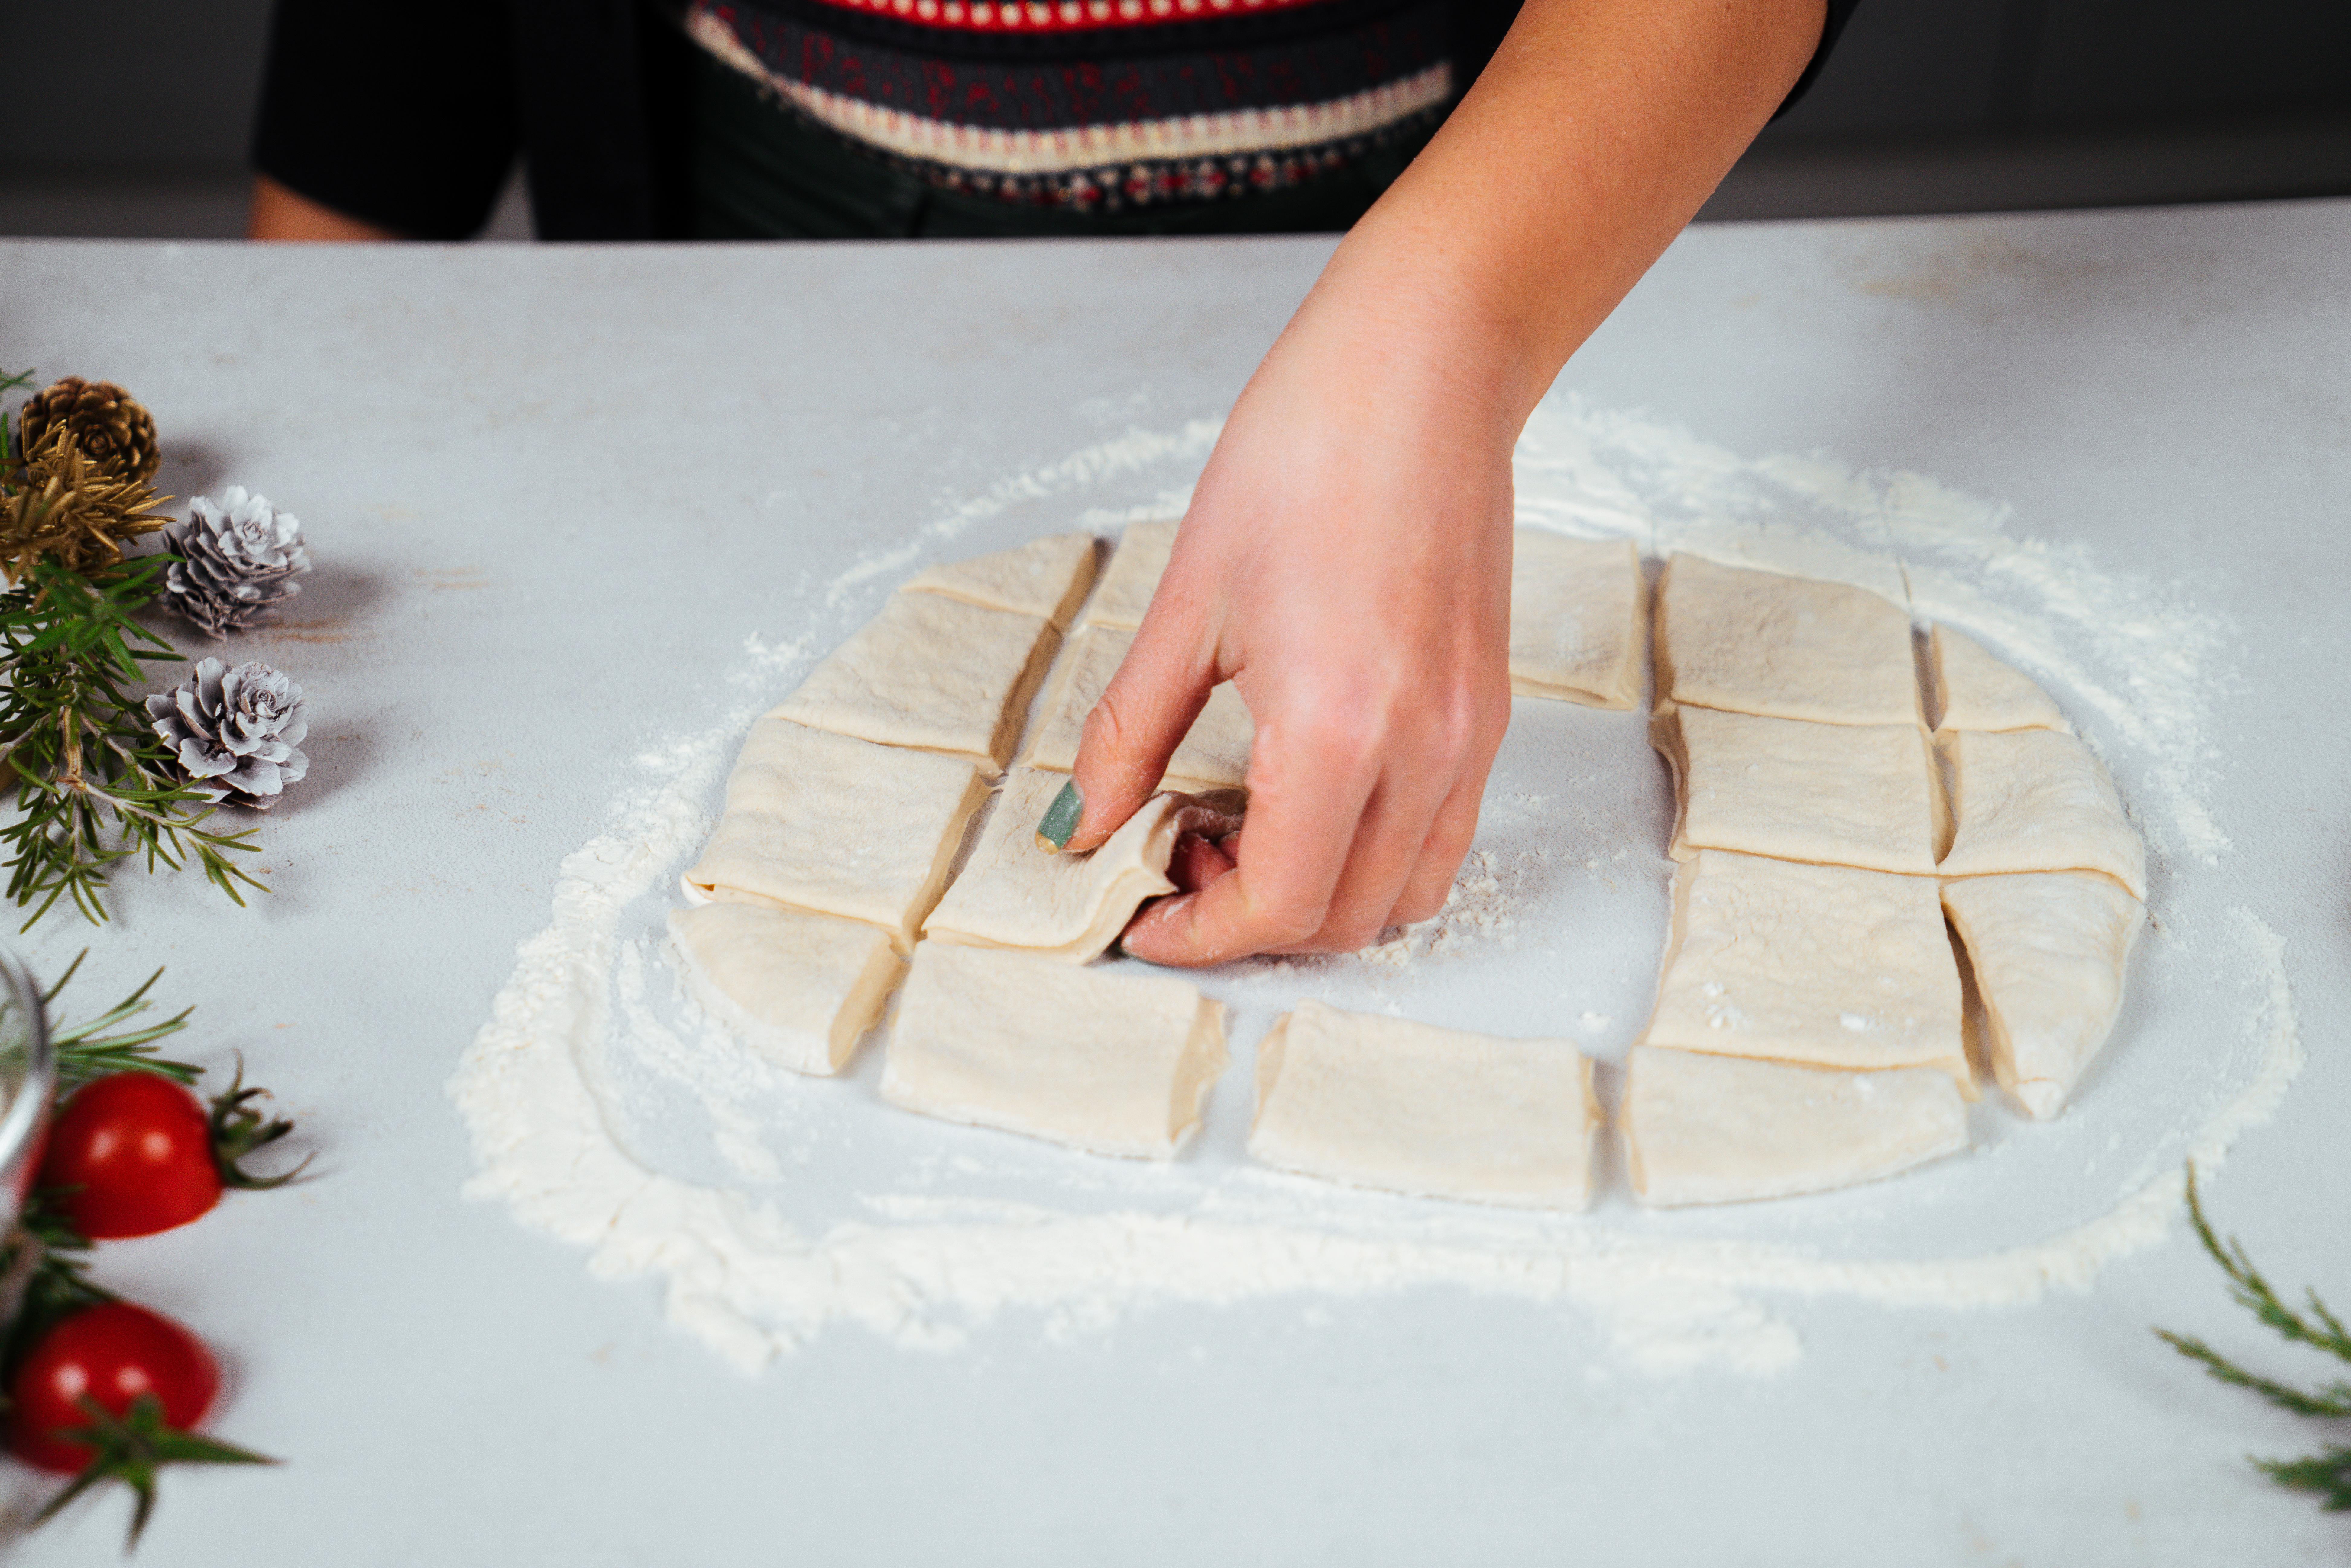 como hacer un pan navideño paso a paso, mini empanadas de masa para pizza, recetas en fotos con todas las etapas de preparacion